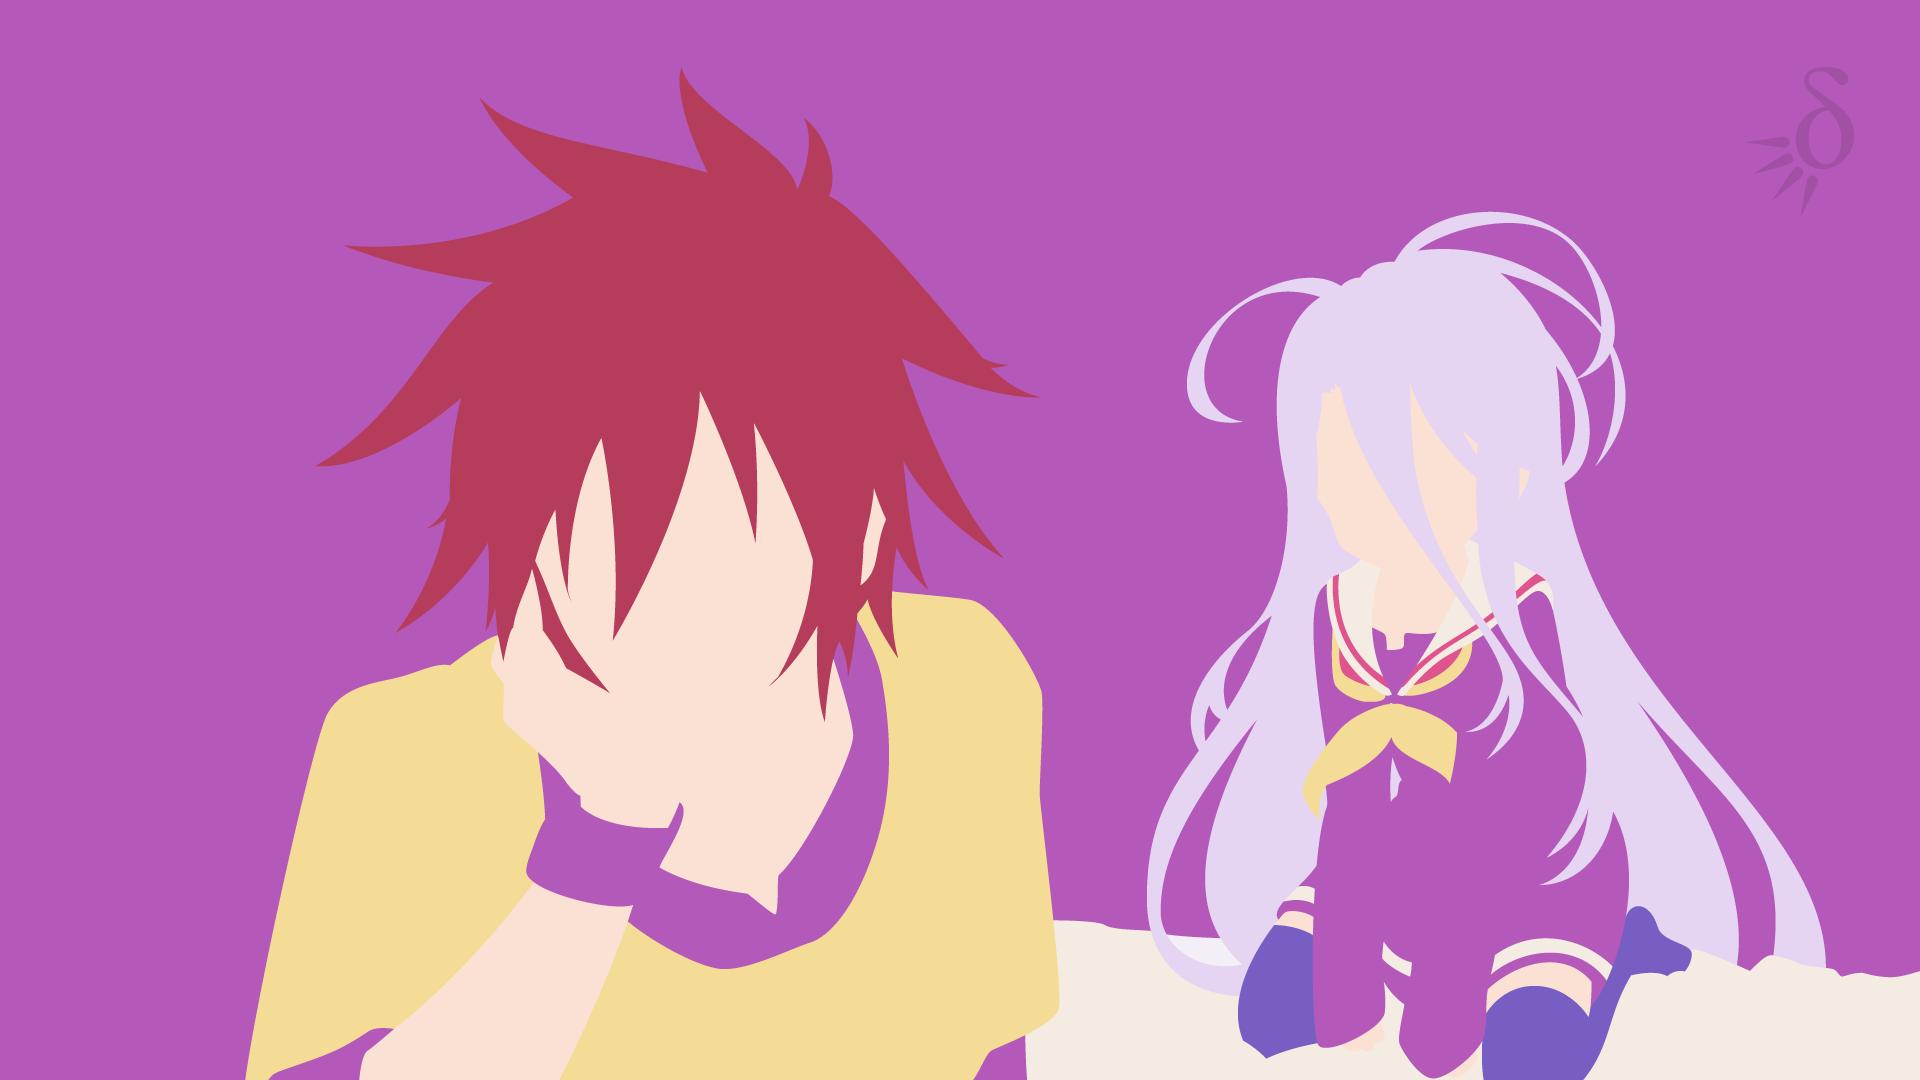 sora and shiro relationship poems